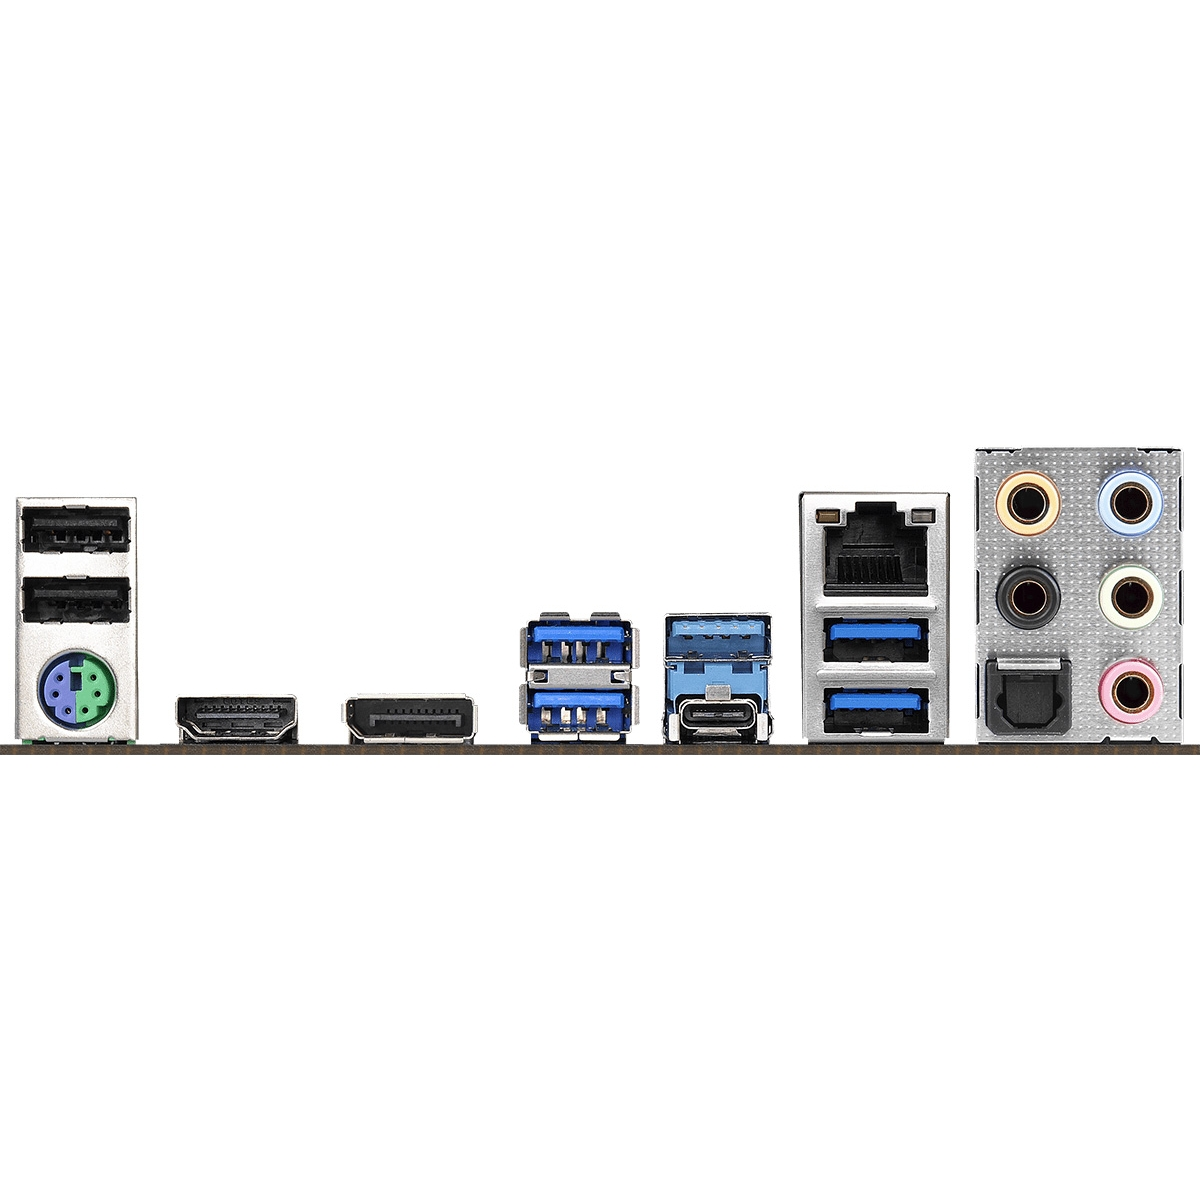 Placa Mãe ASRock B365 Phantom Gaming 4, Chipset B365, Intel LGA 1151, ATX, DDR4